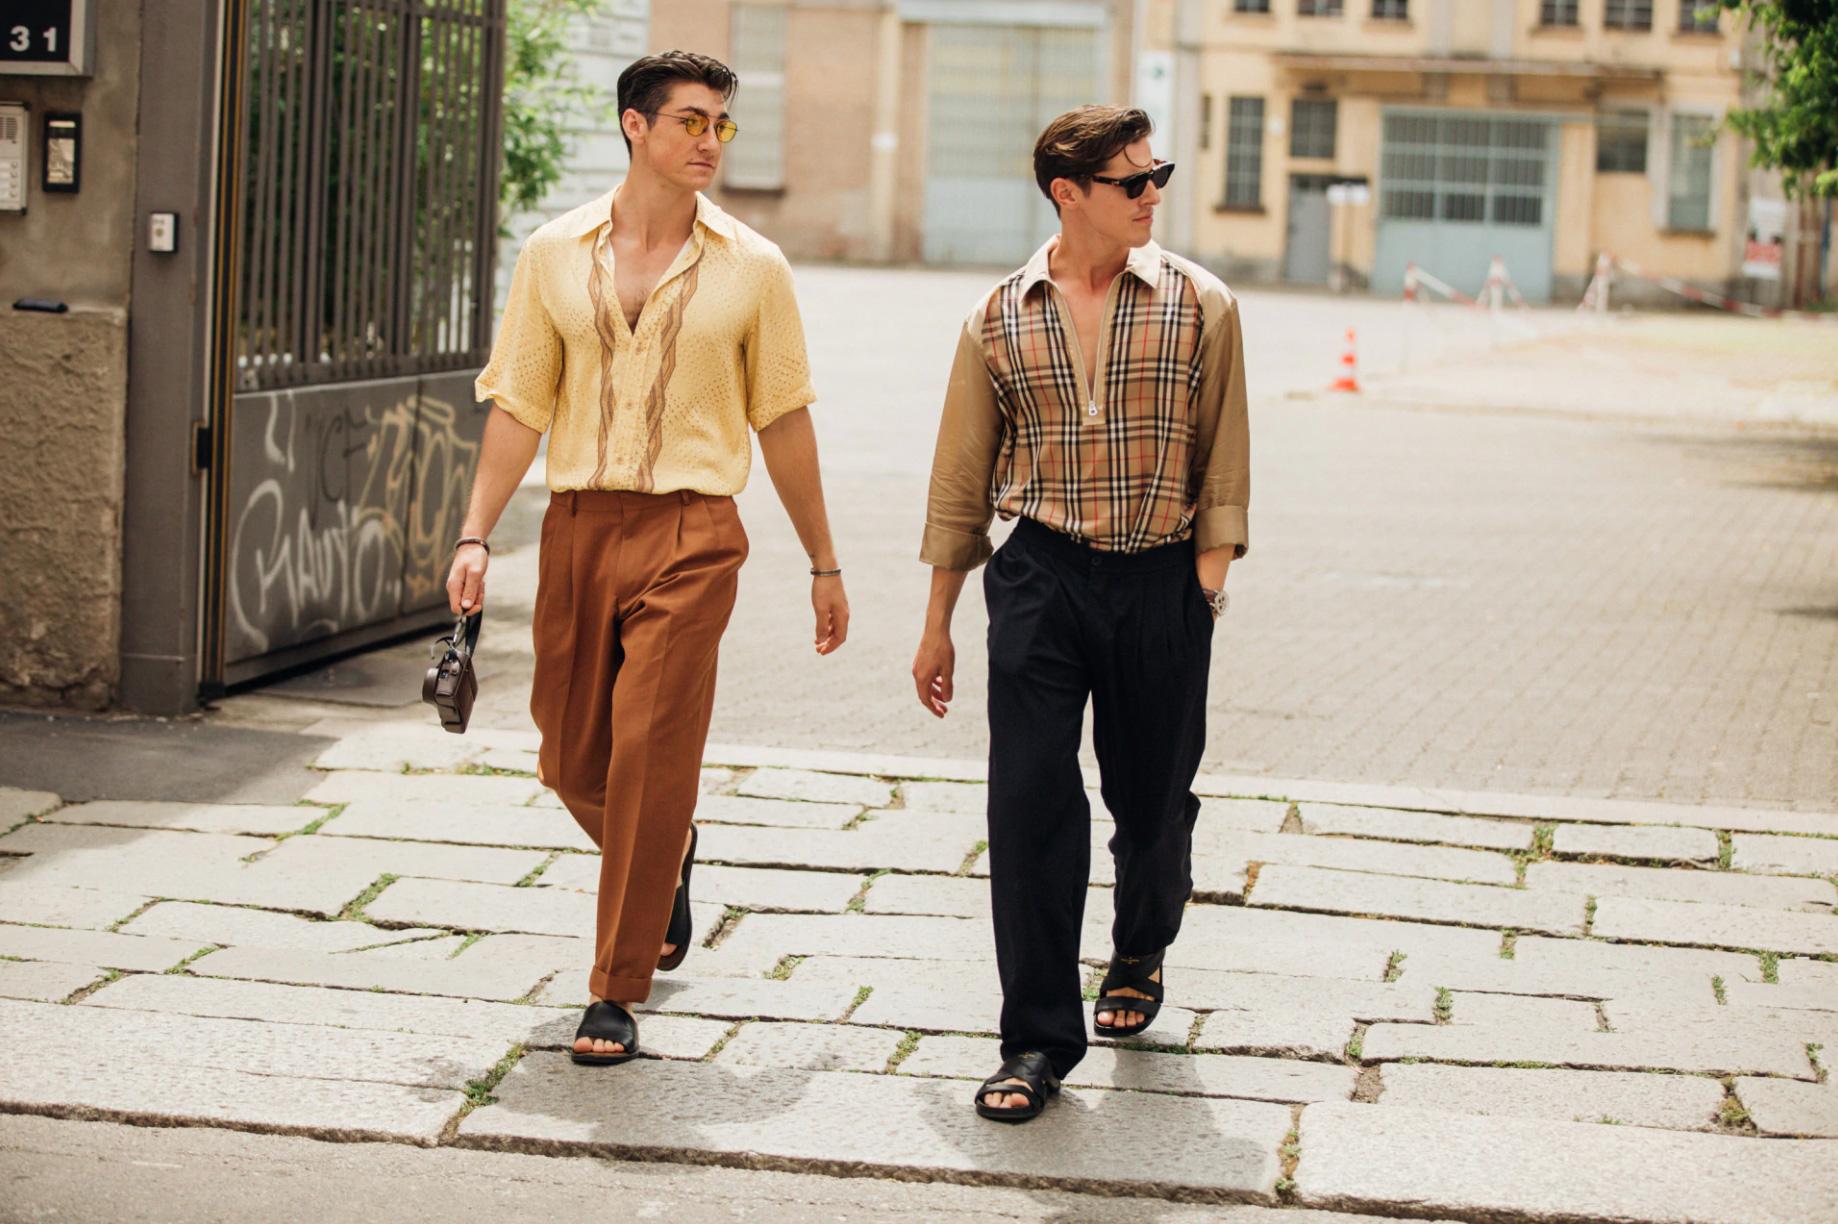 By Jonathan Daniel Pryce for Milan Fashion Week / Vogue